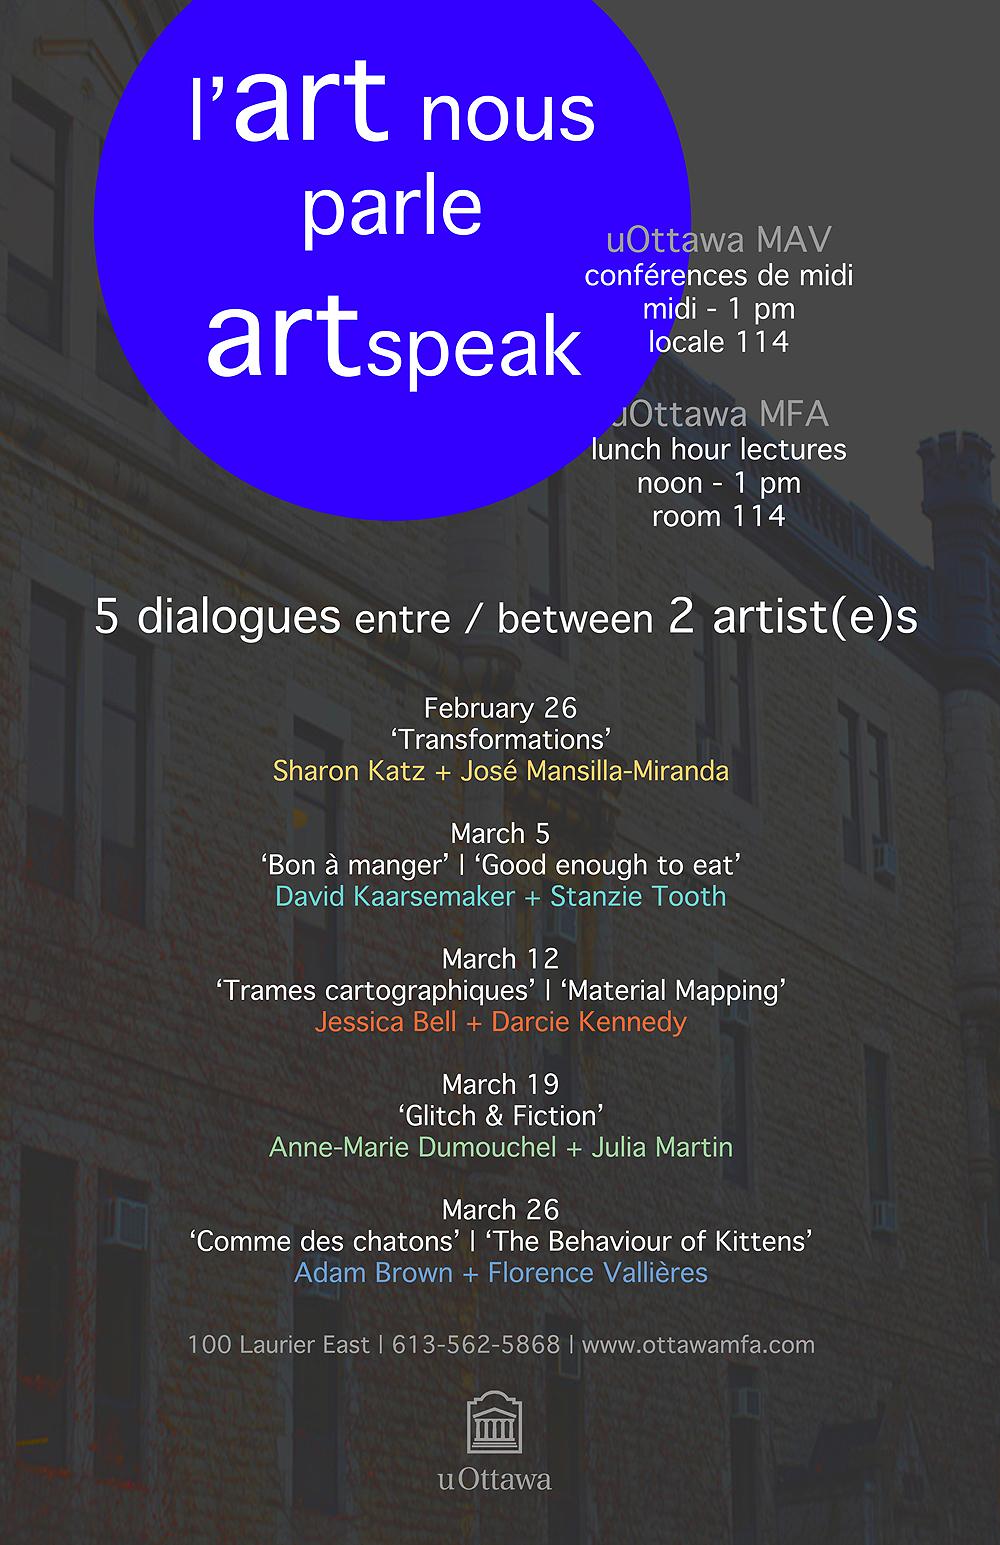 ArtSpeakPoster-medium.jpg